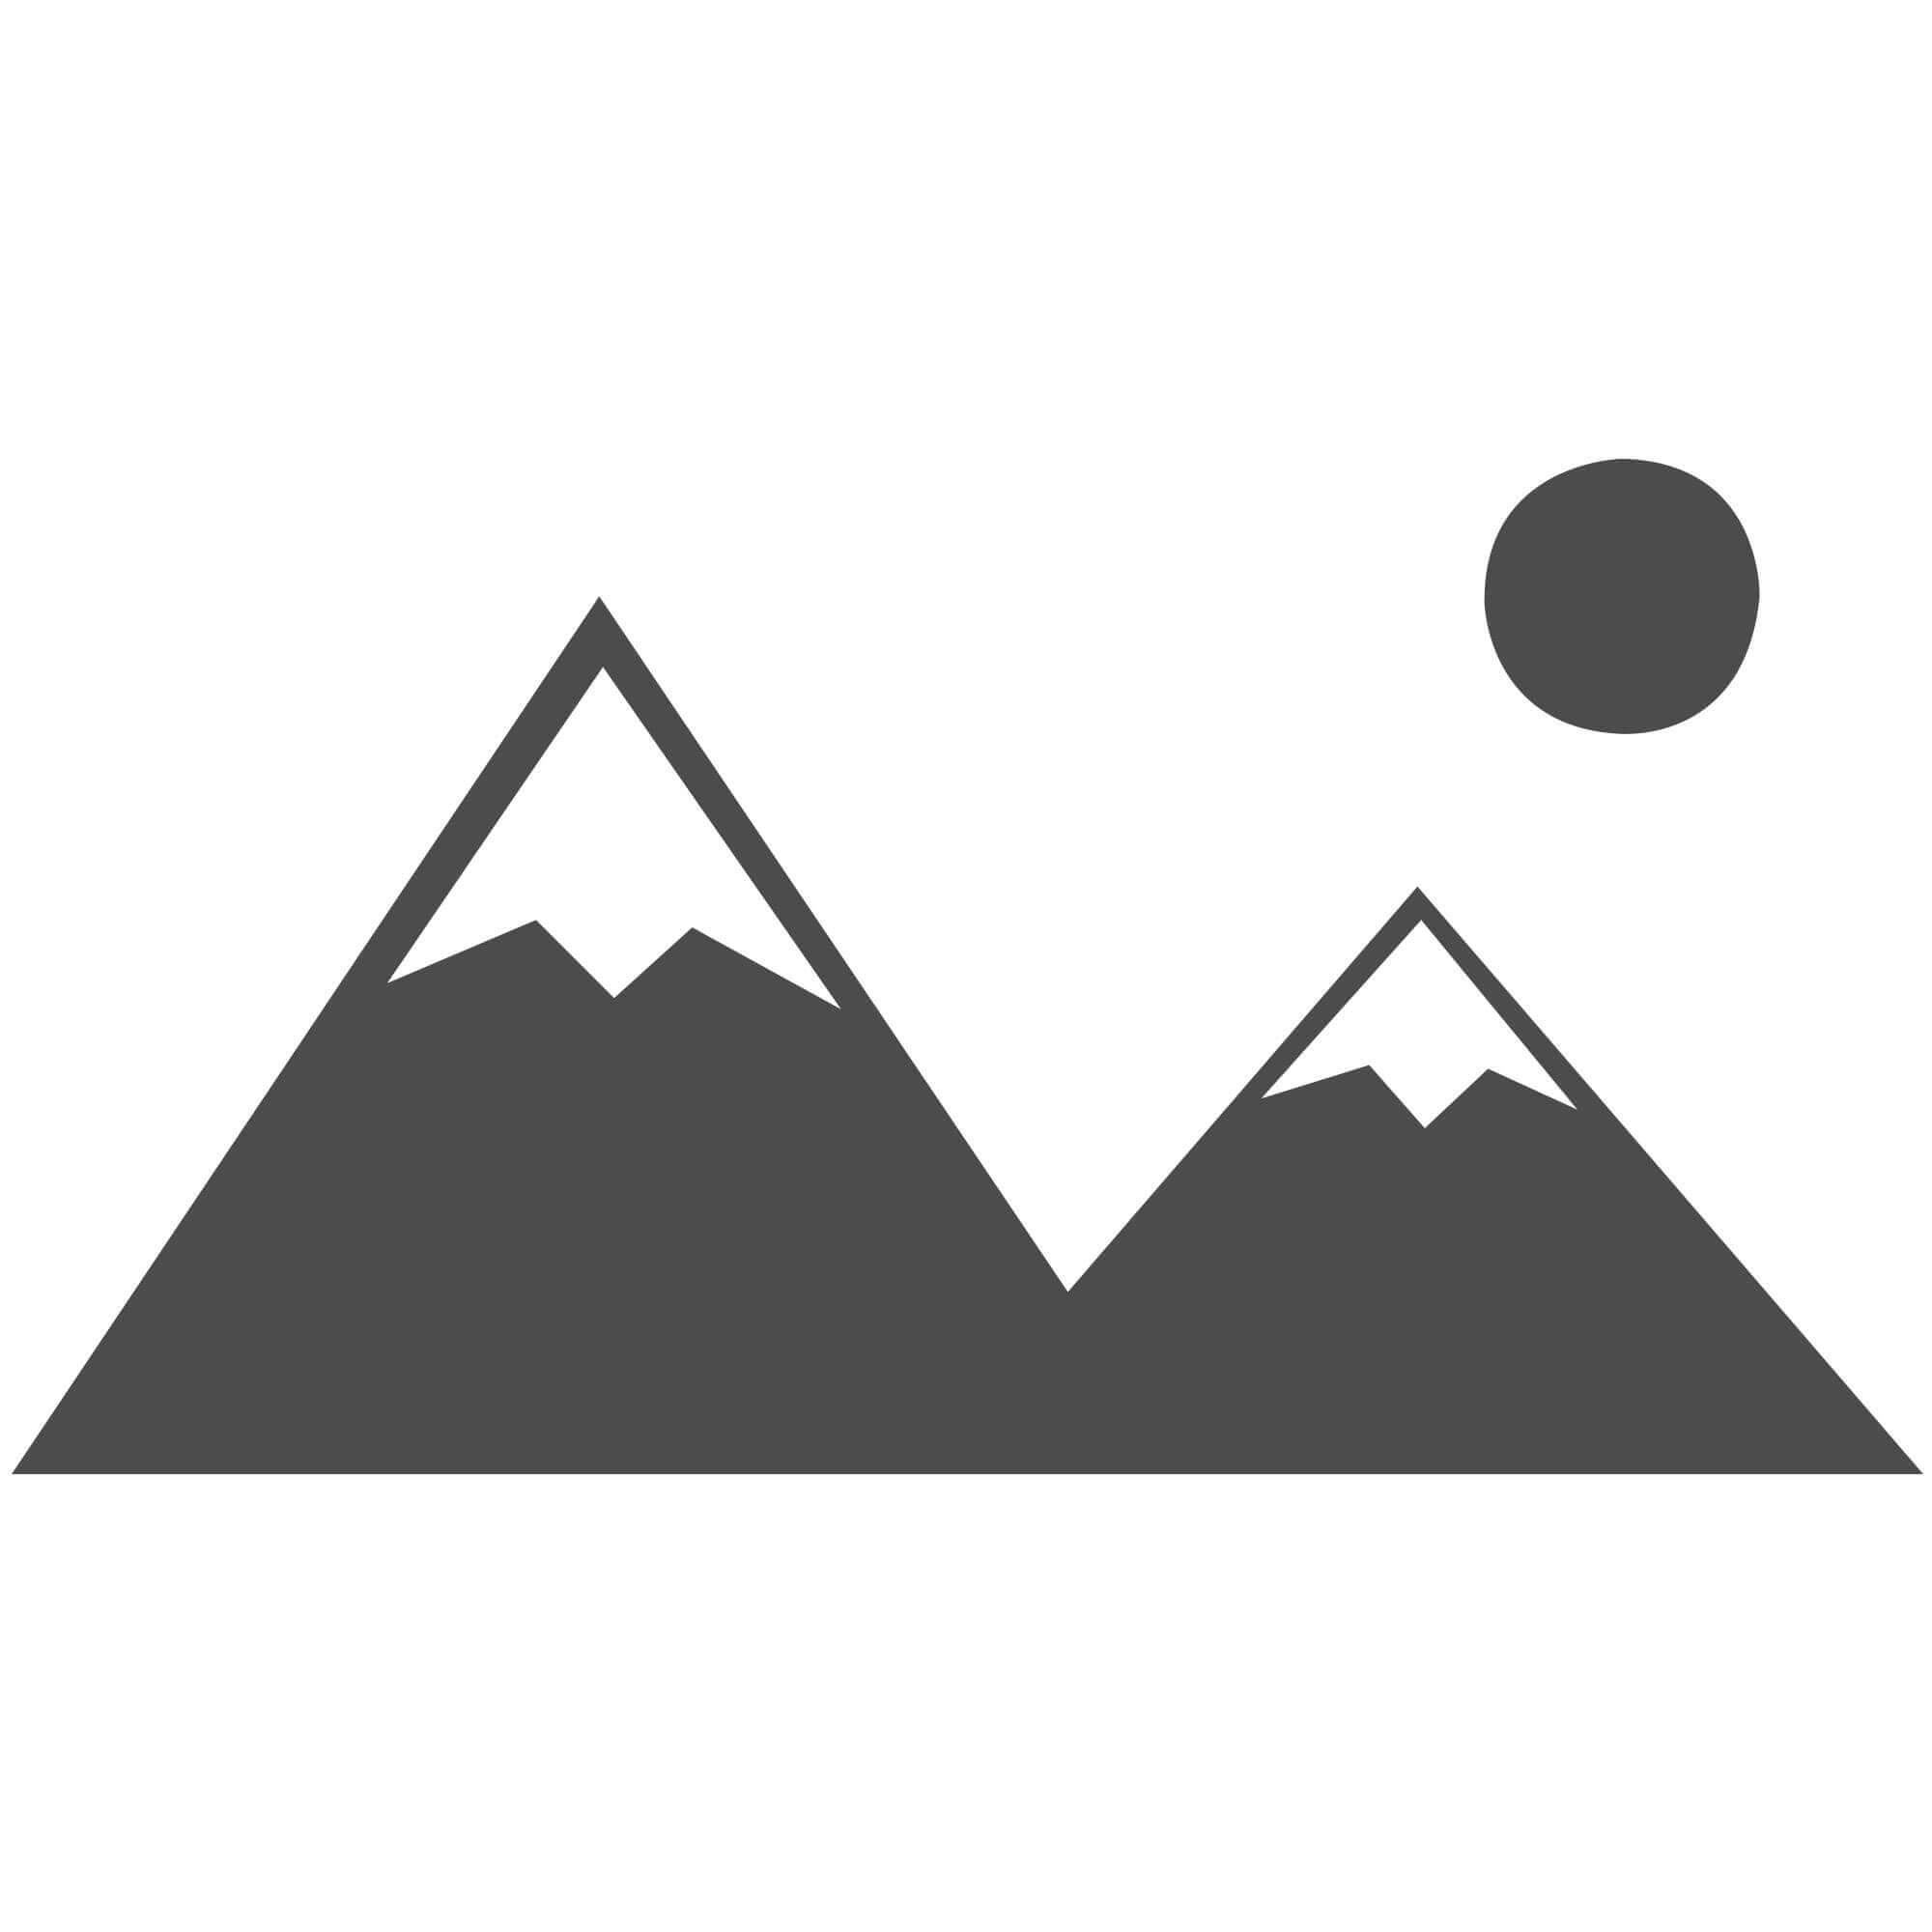 "Griot Stripe Rug - Kalimba - KI804 Clove-160 x 226 cm (5'3"" x 7'5"")"